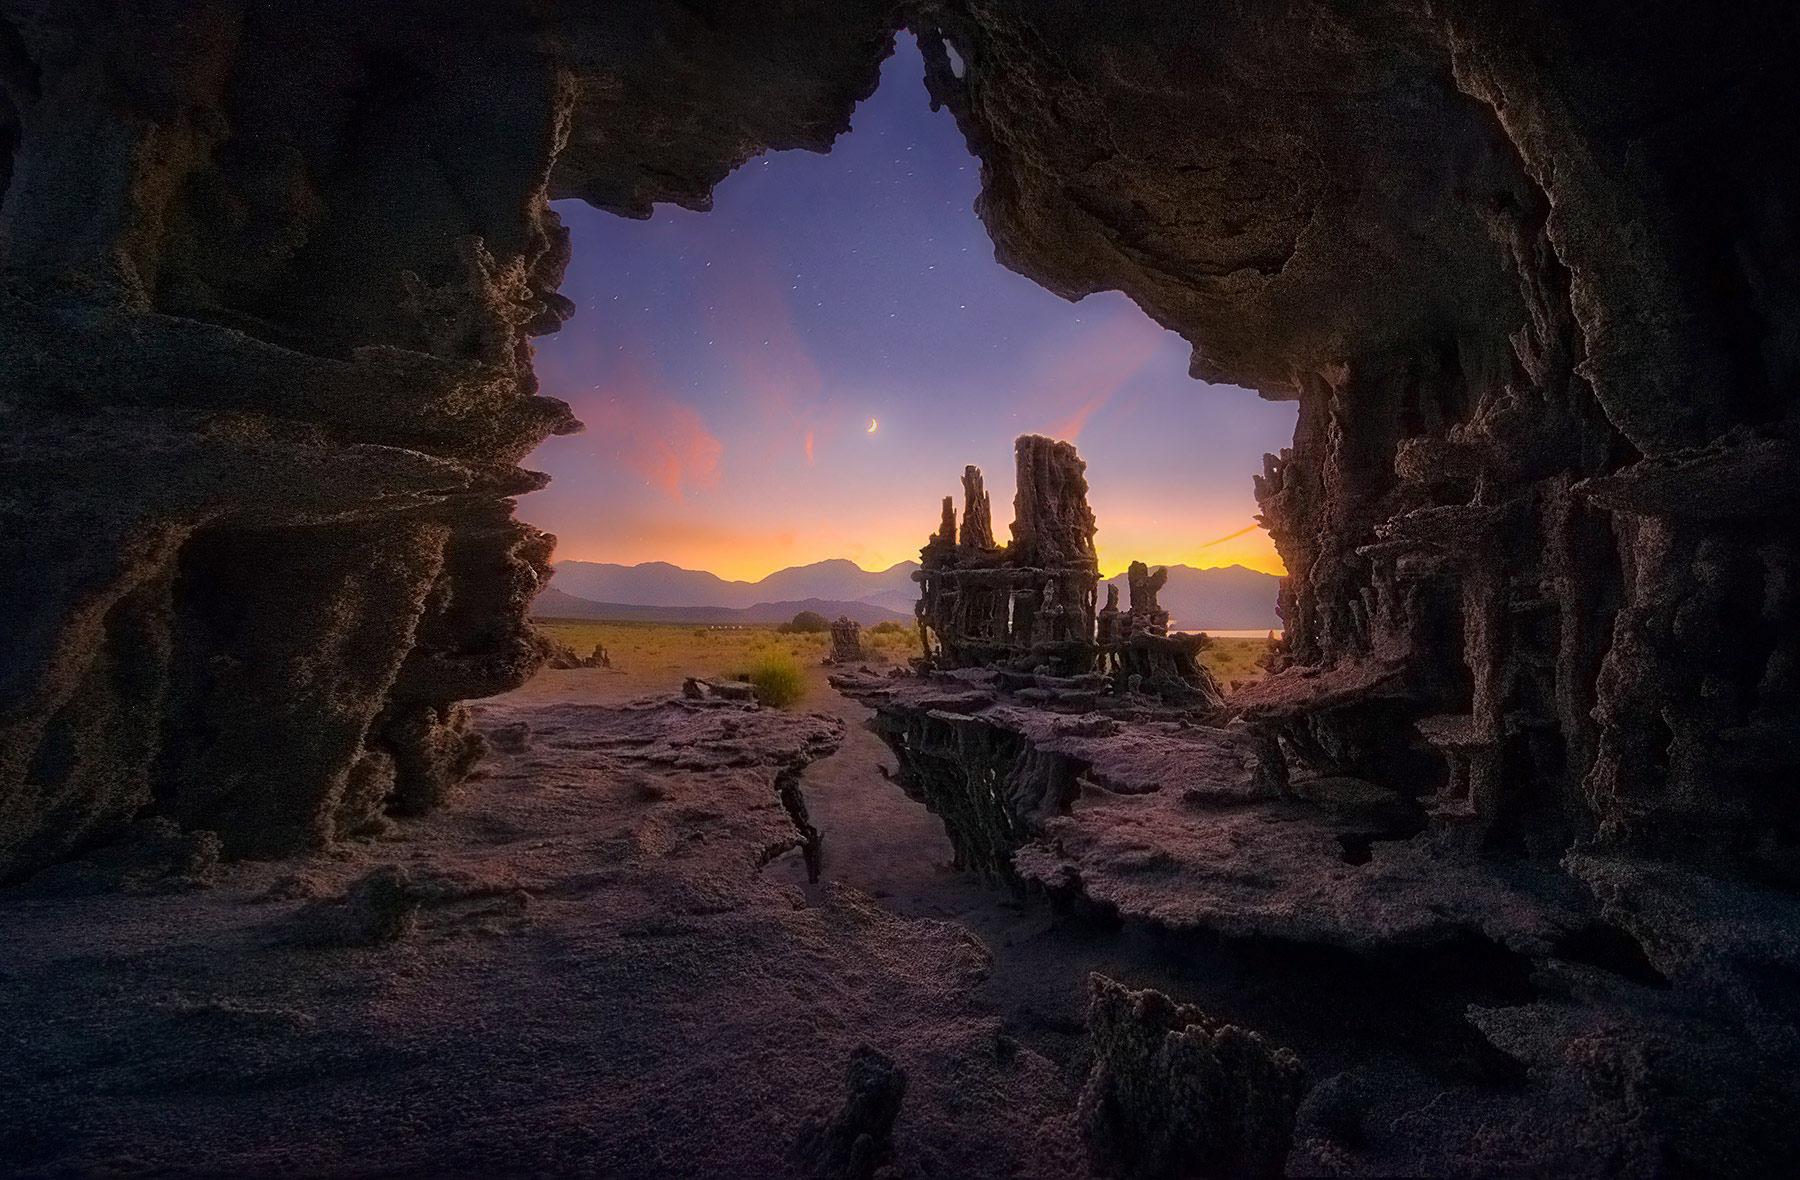 twilight, tufa, unique, cave, mono lake, photo